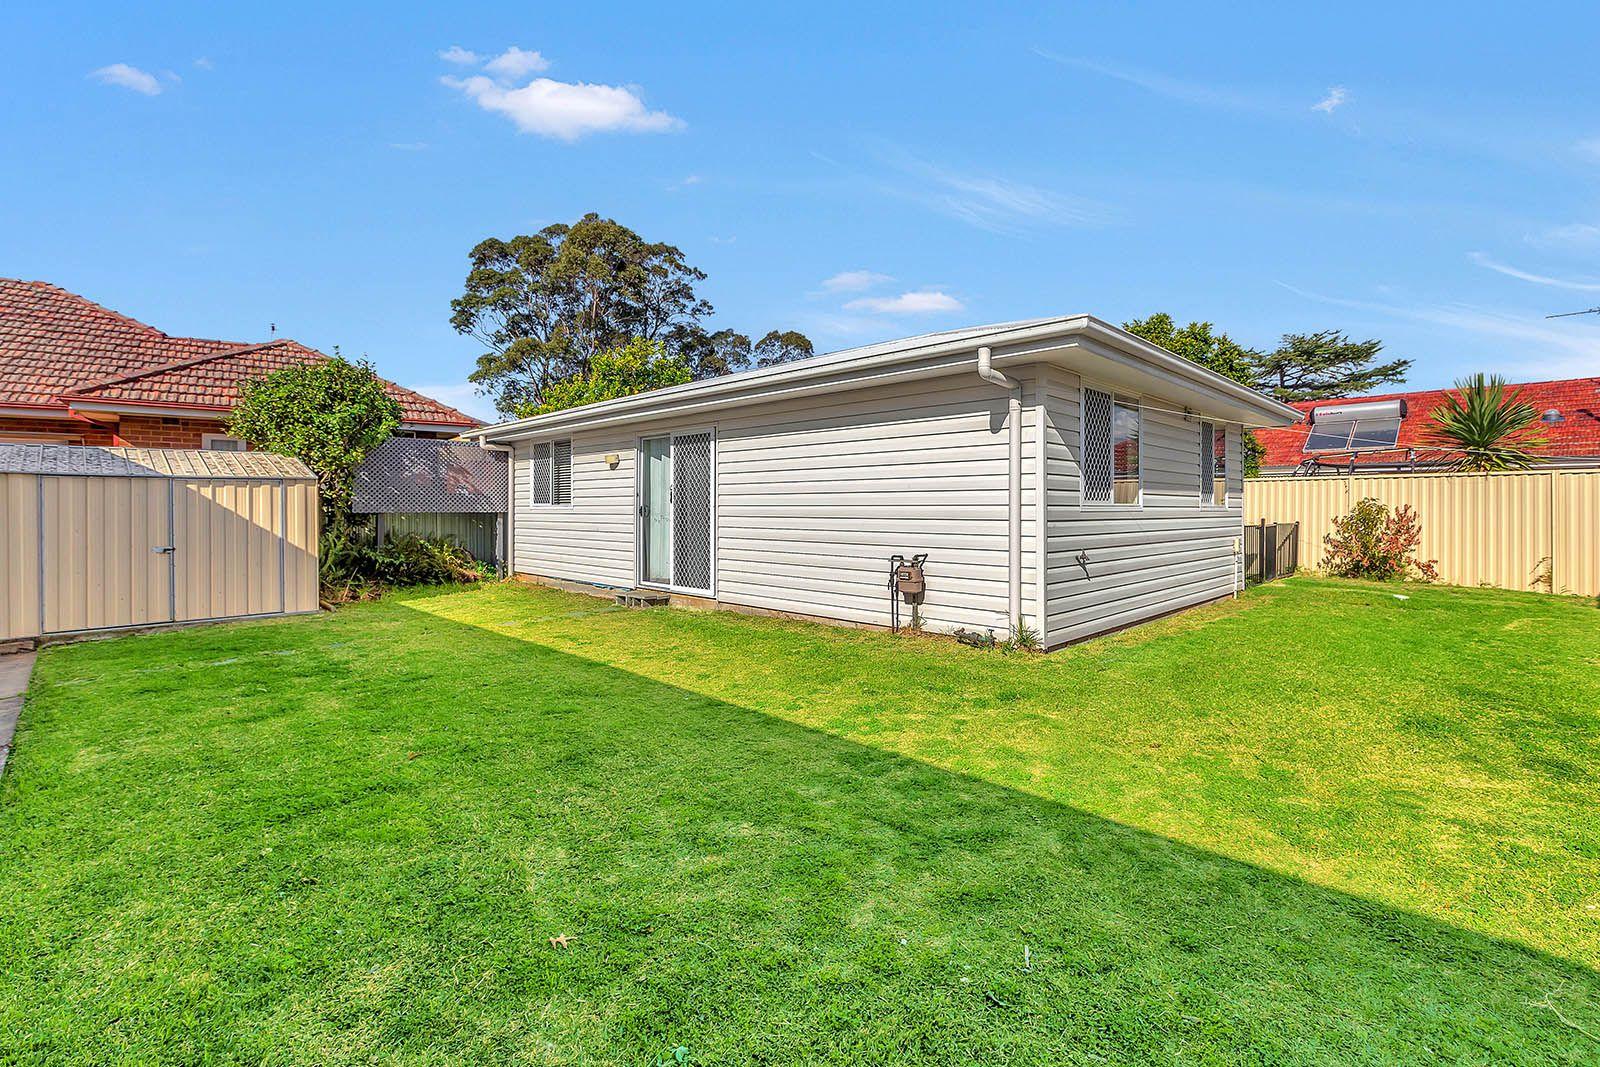 48A Seven Hills Road, Baulkham Hills NSW 2153, Image 0